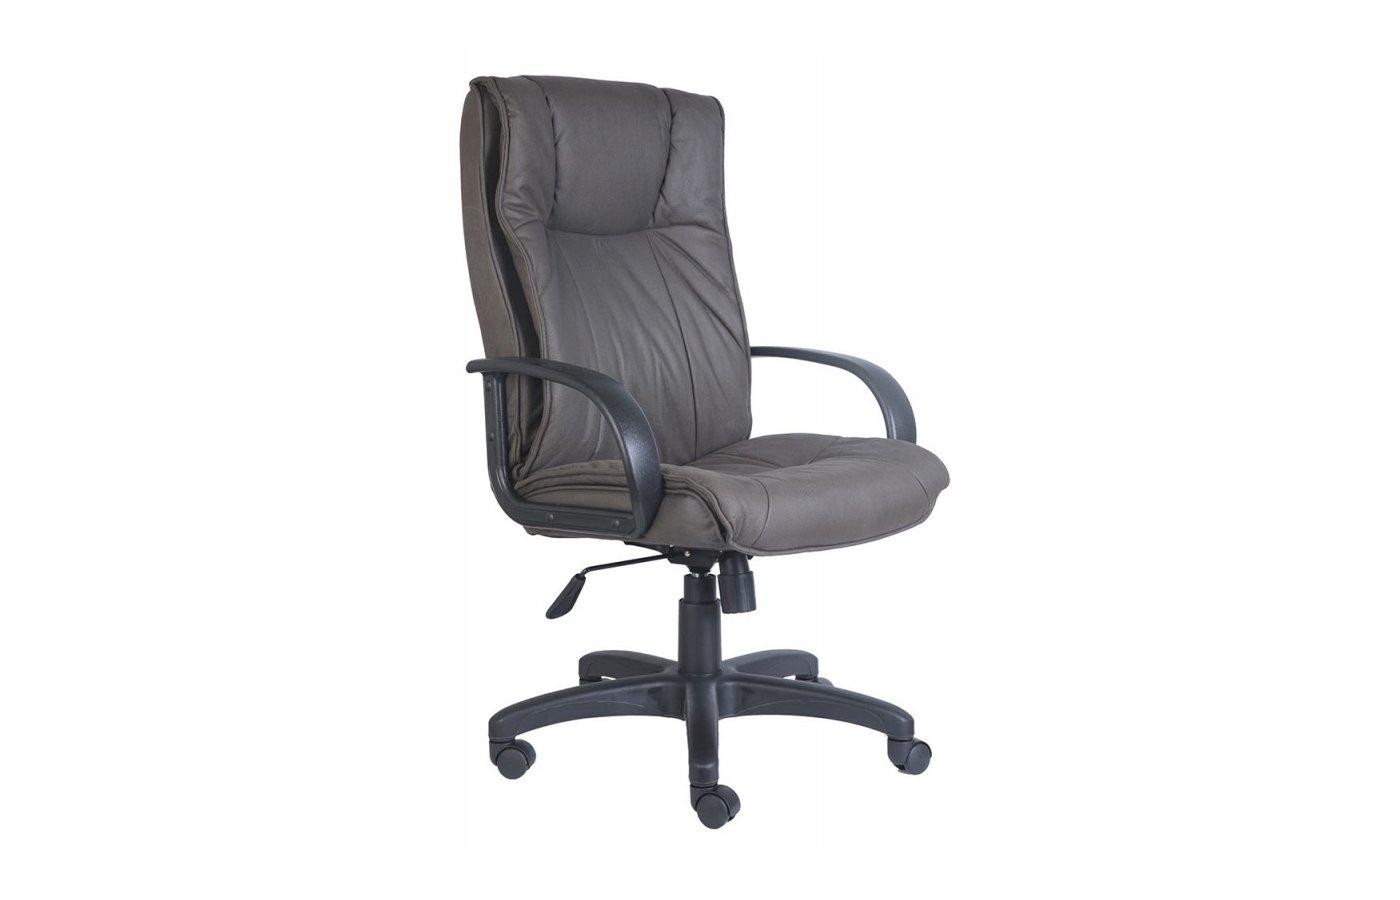 Кресло руководителя Бюрократ CH-838AXSN/F4 темно-серый F4 нубук